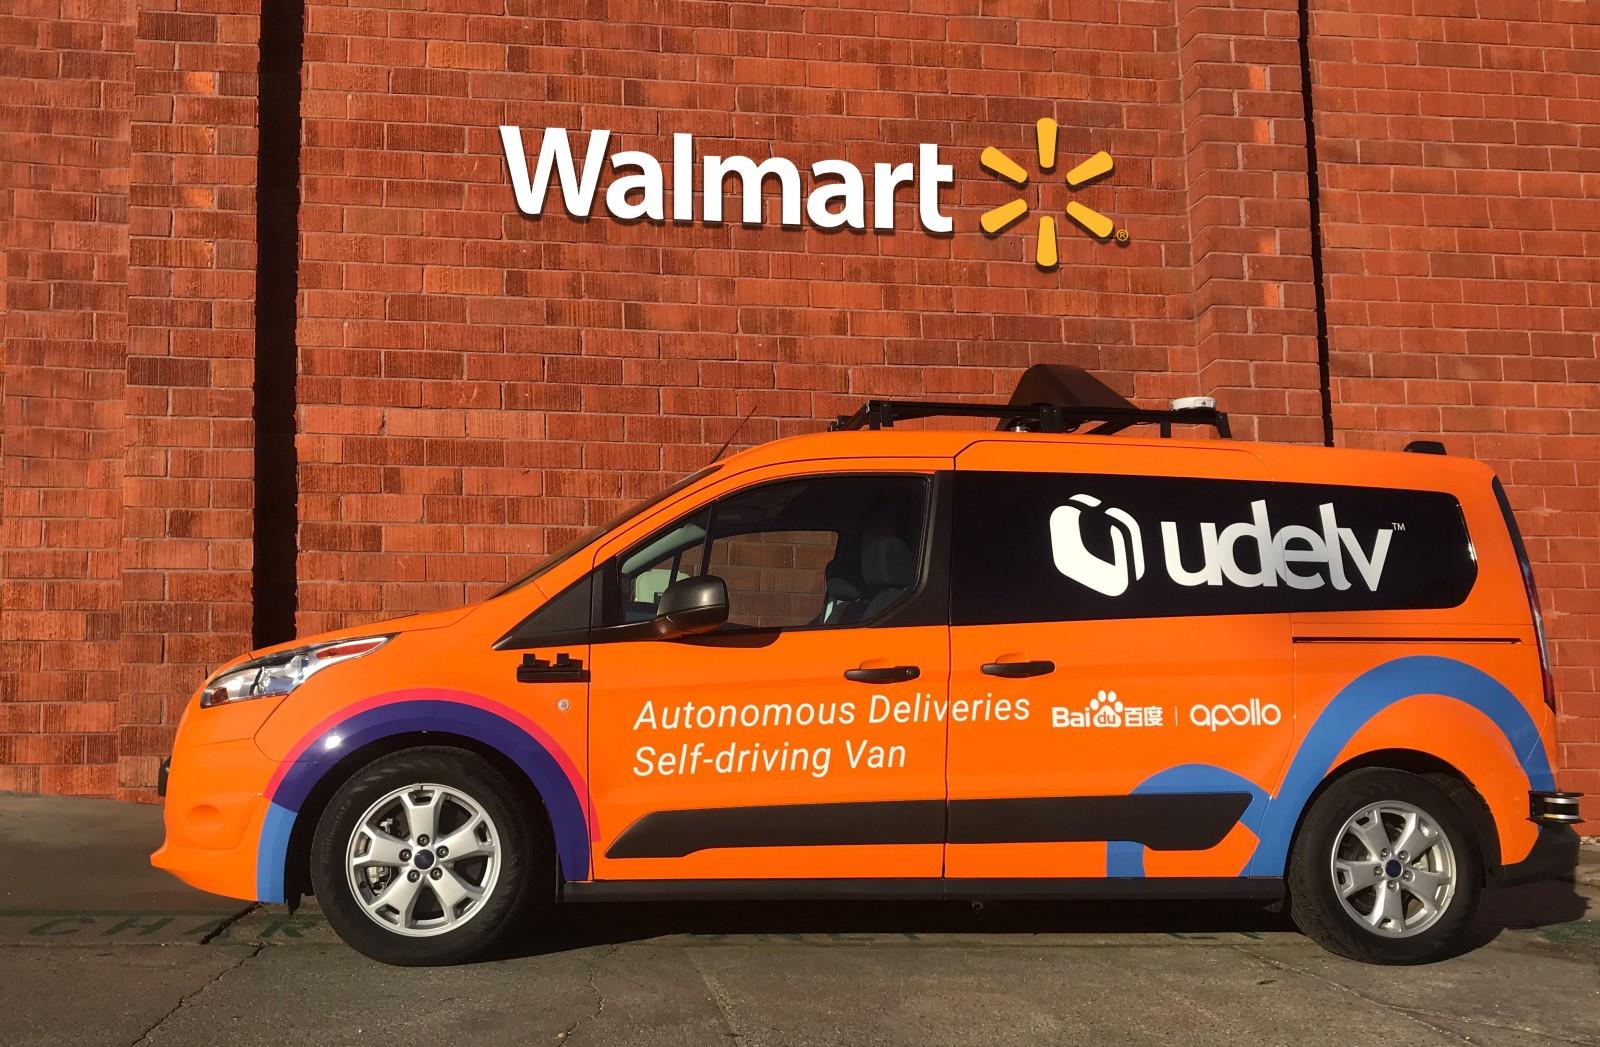 Walmart Trials New Self Driving Delivery Service In Arizona